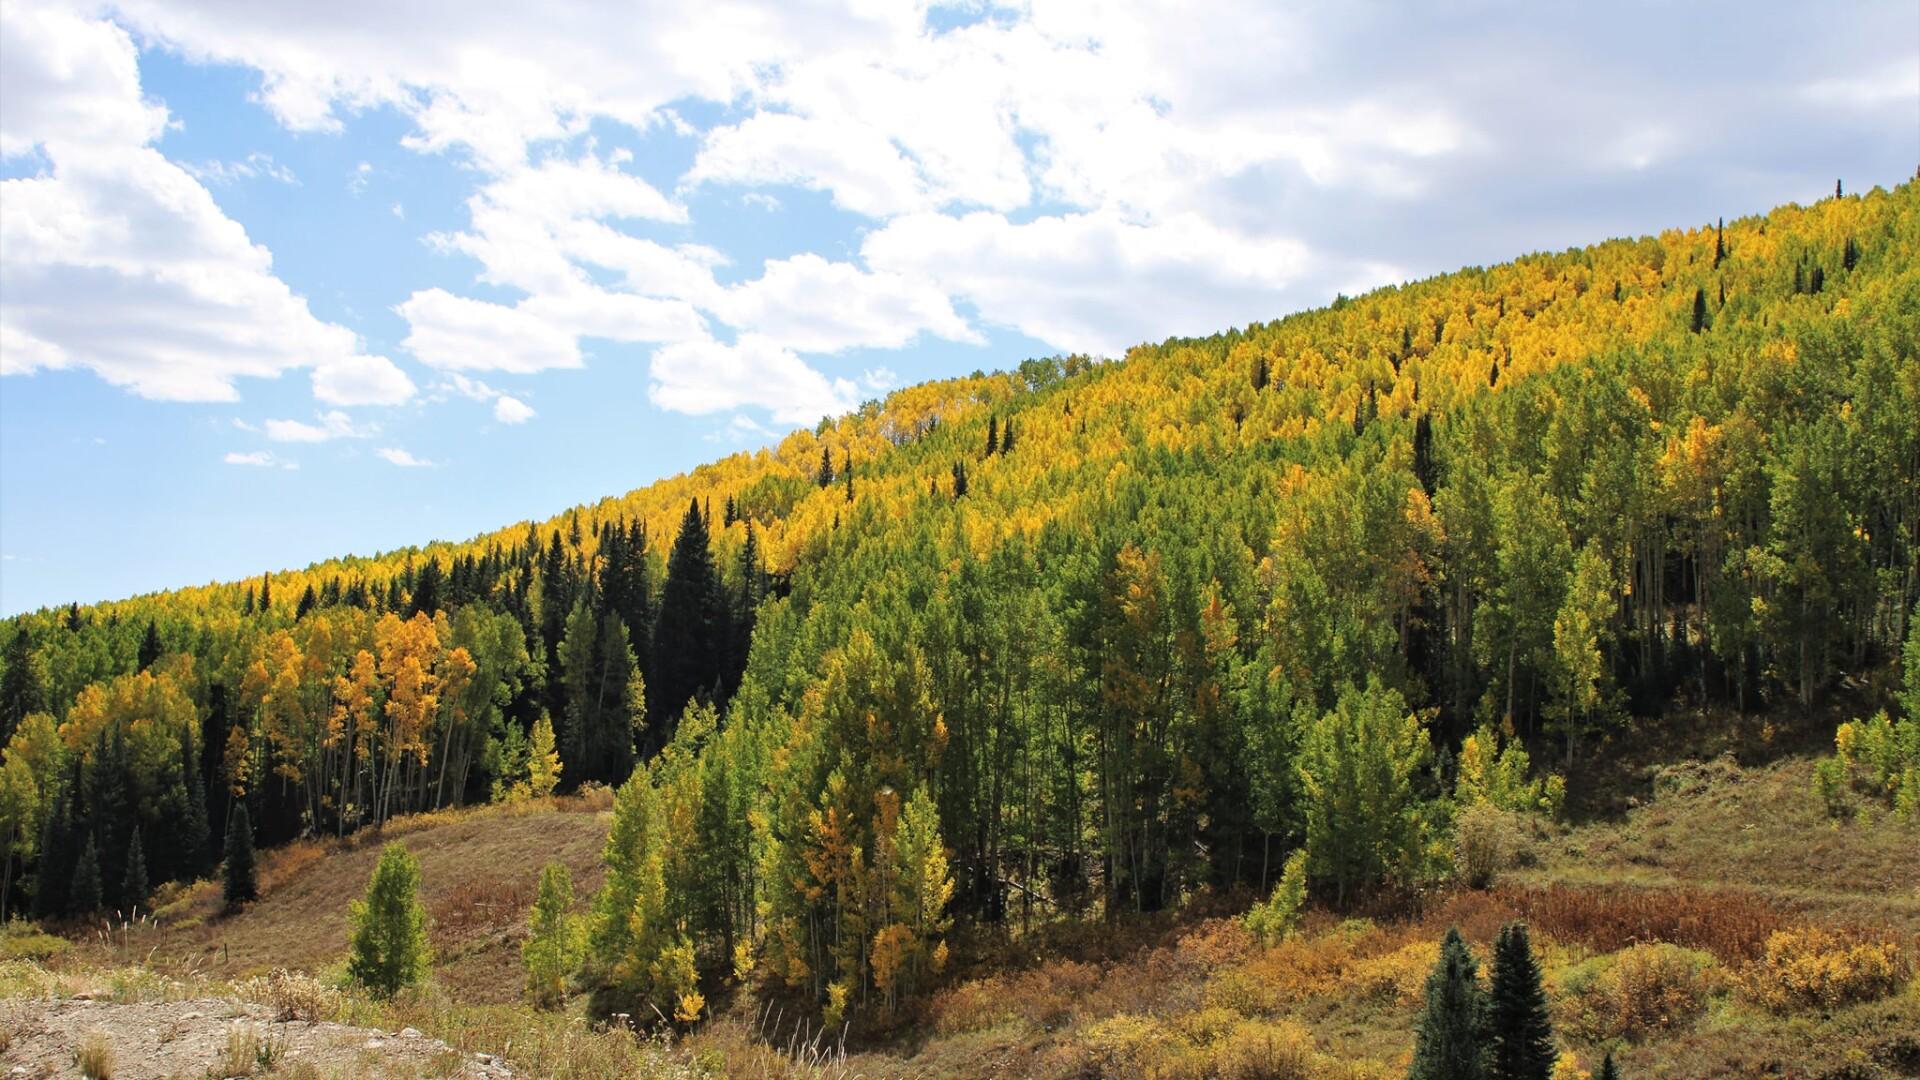 2Crested Butte Daniel Gee 2.jpg